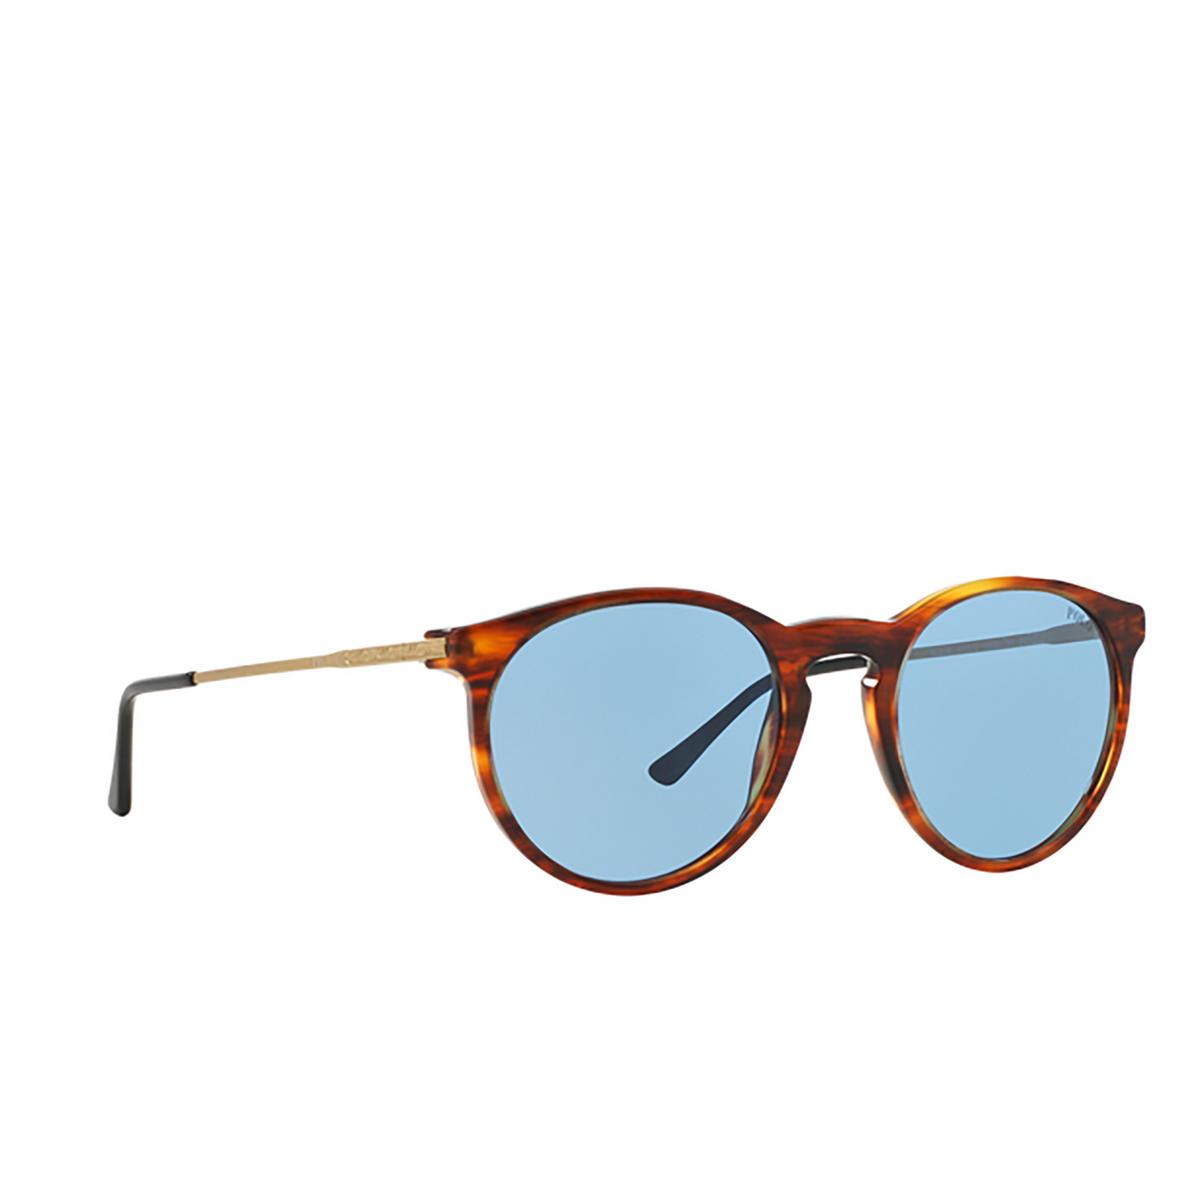 Polo Ralph Lauren® Round Sunglasses: PH4096 color 500772.